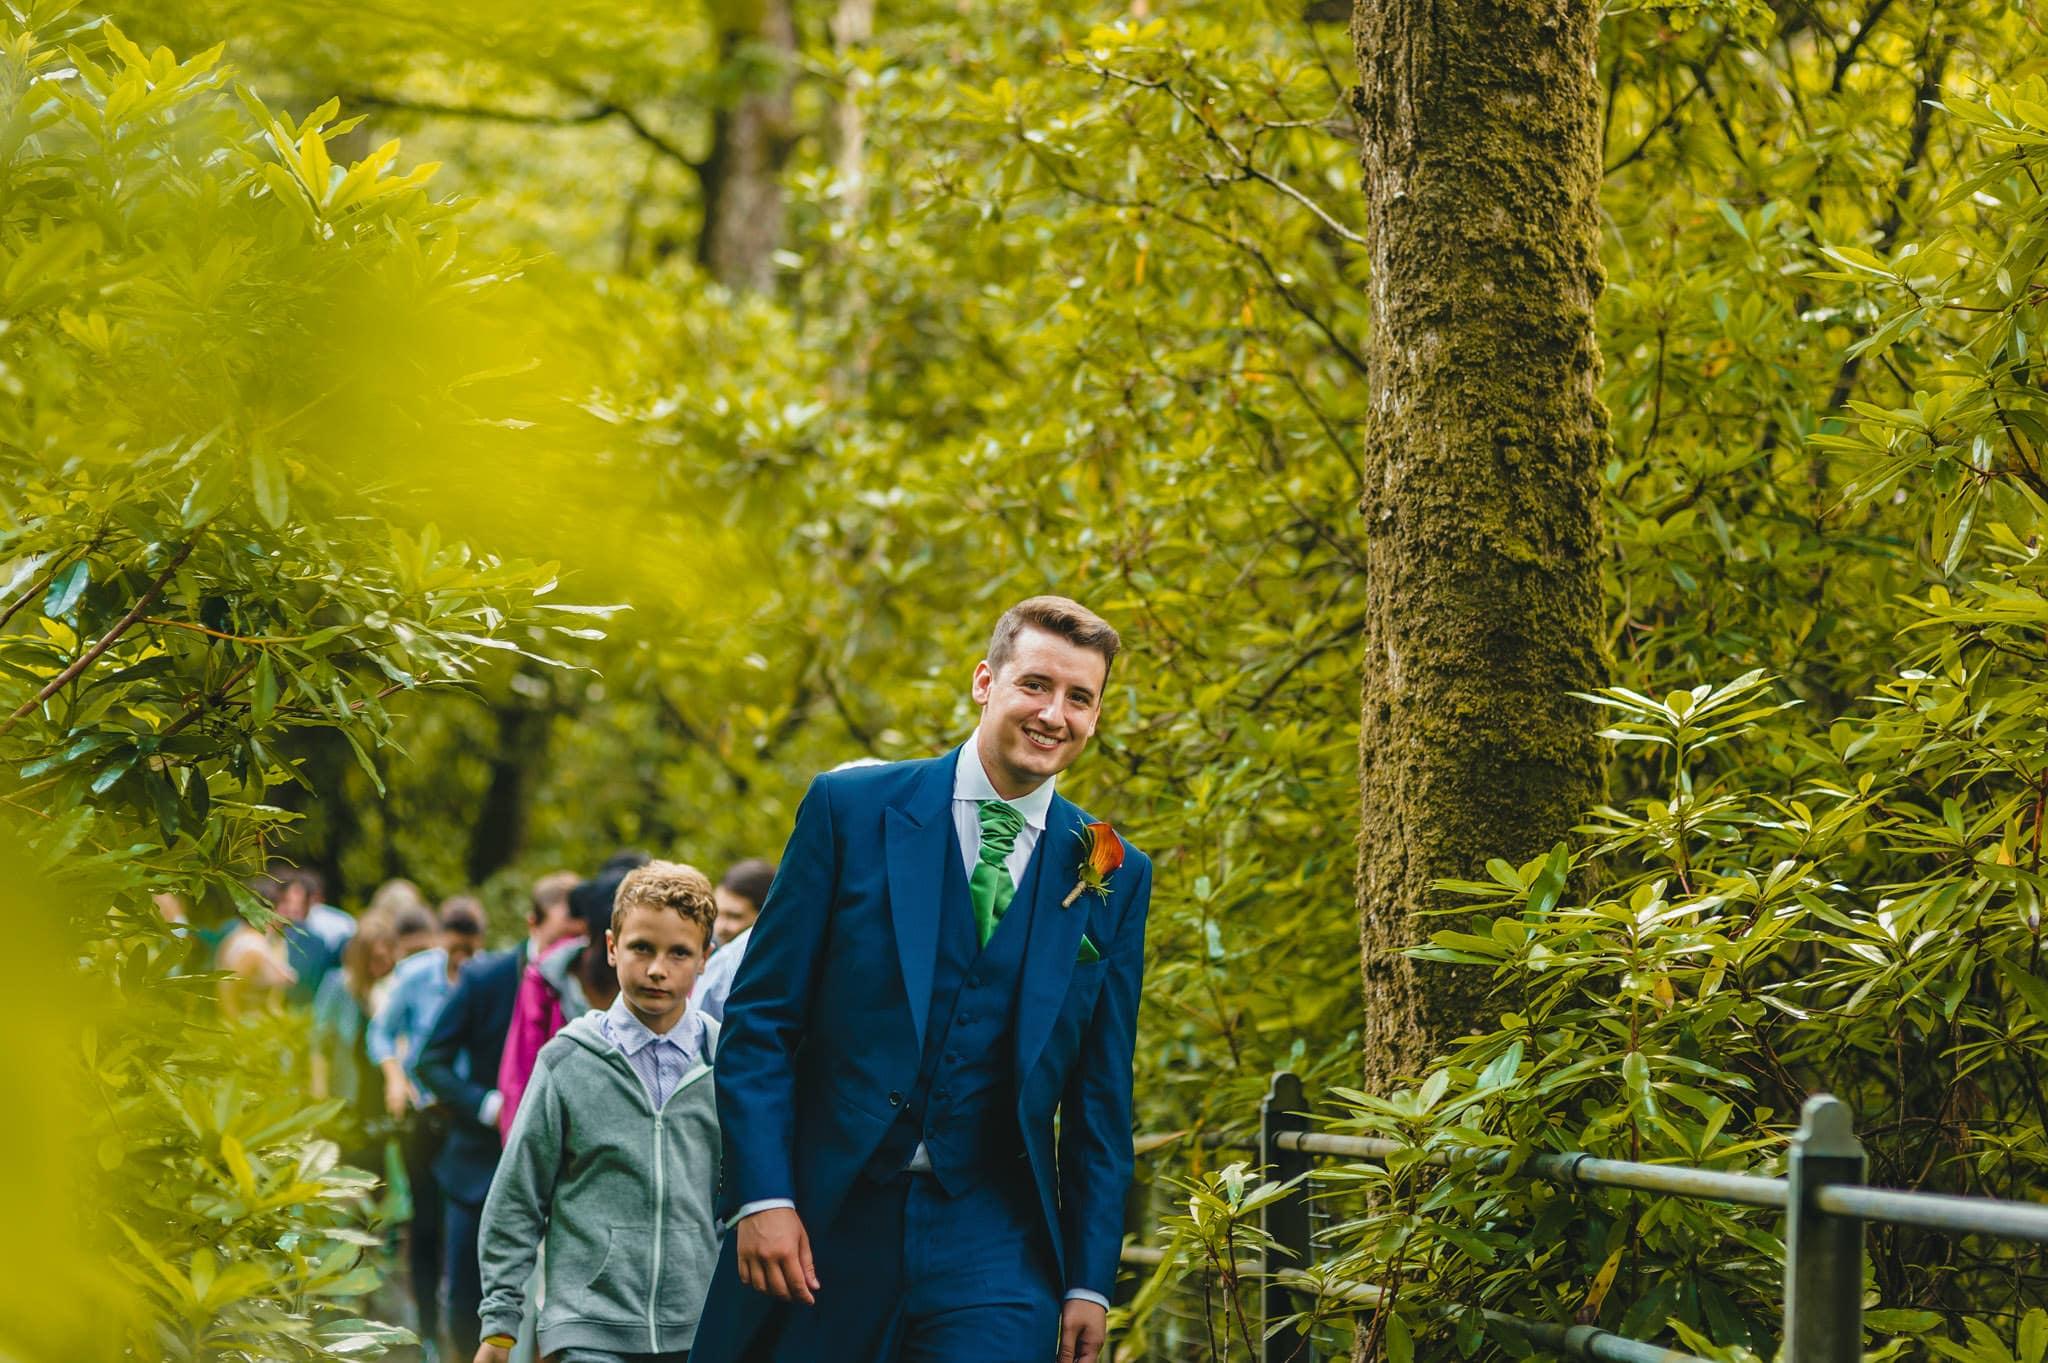 Wedding photography at Y Talbot Hotel in Tregaron, Wales   Tina + Phil 37